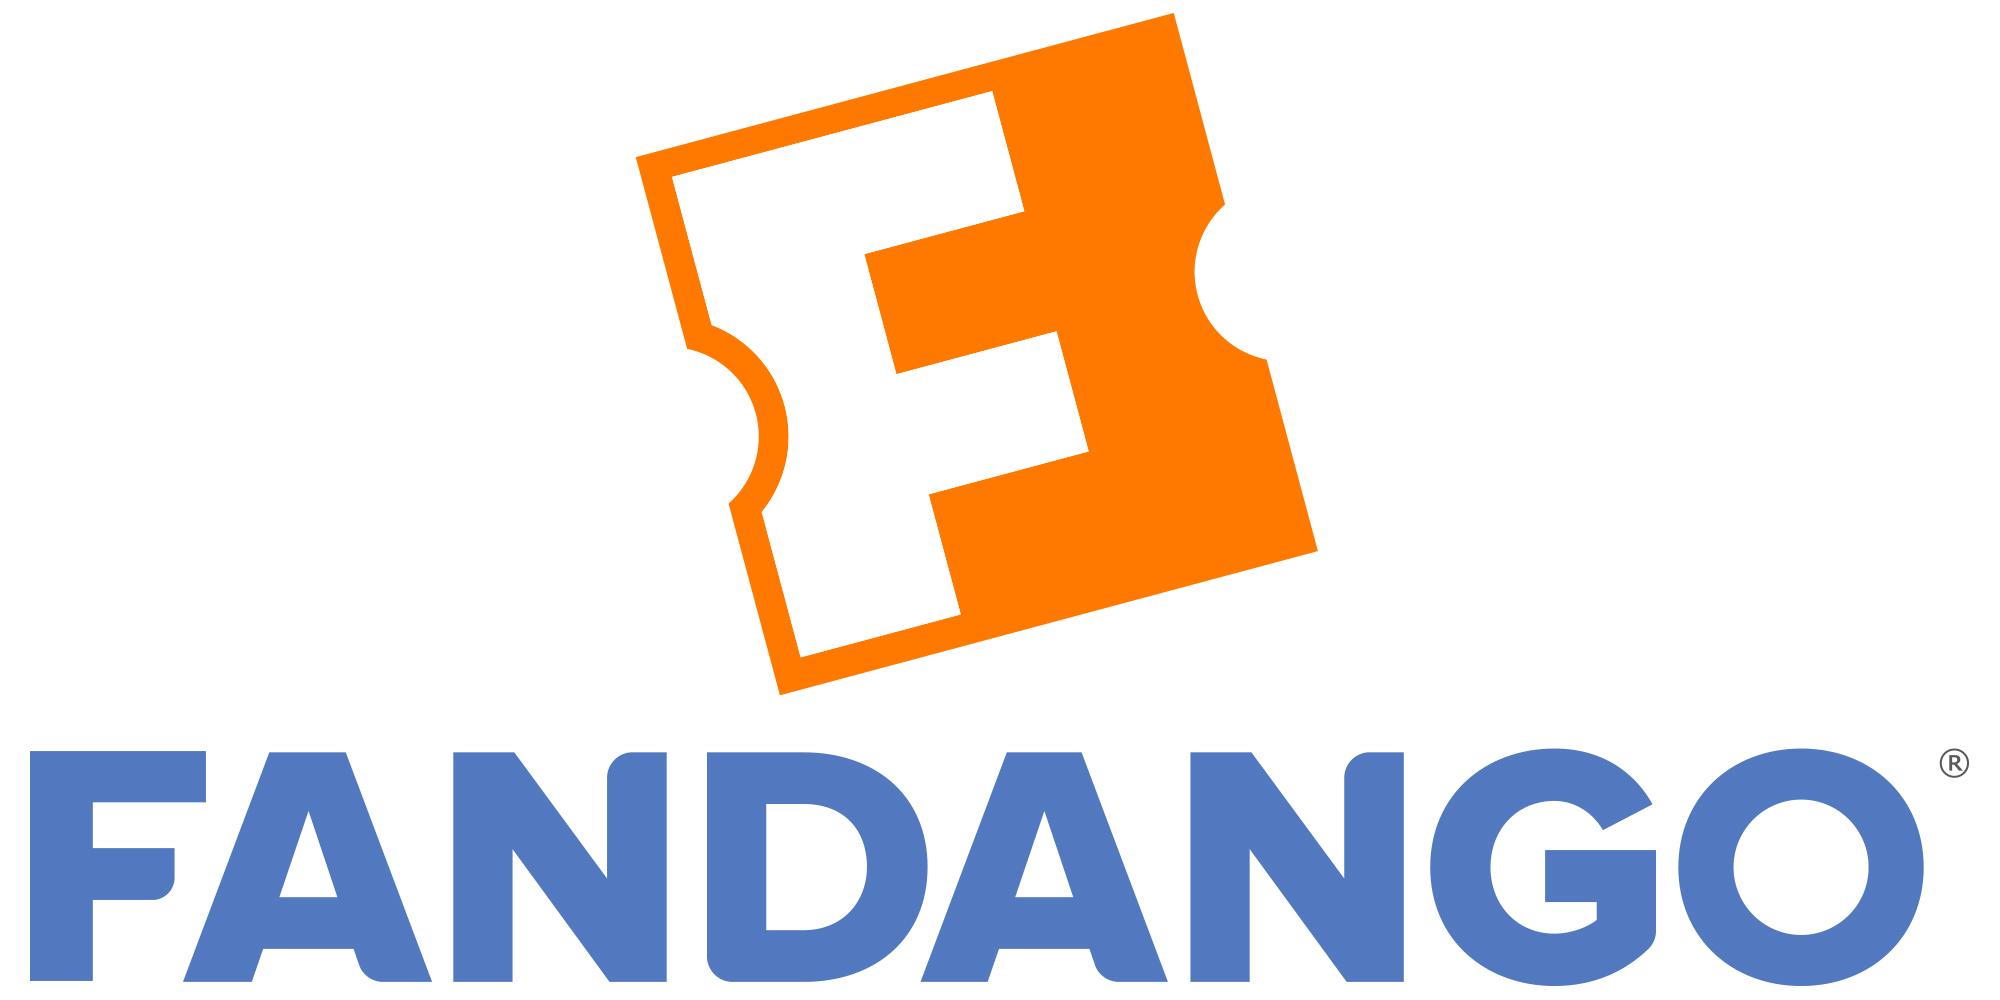 Online ticketseller fandango acquires digital movie brands online ticketseller fandango acquires digital movie brands flixster and rotten tomatoes indiewire xflitez Gallery